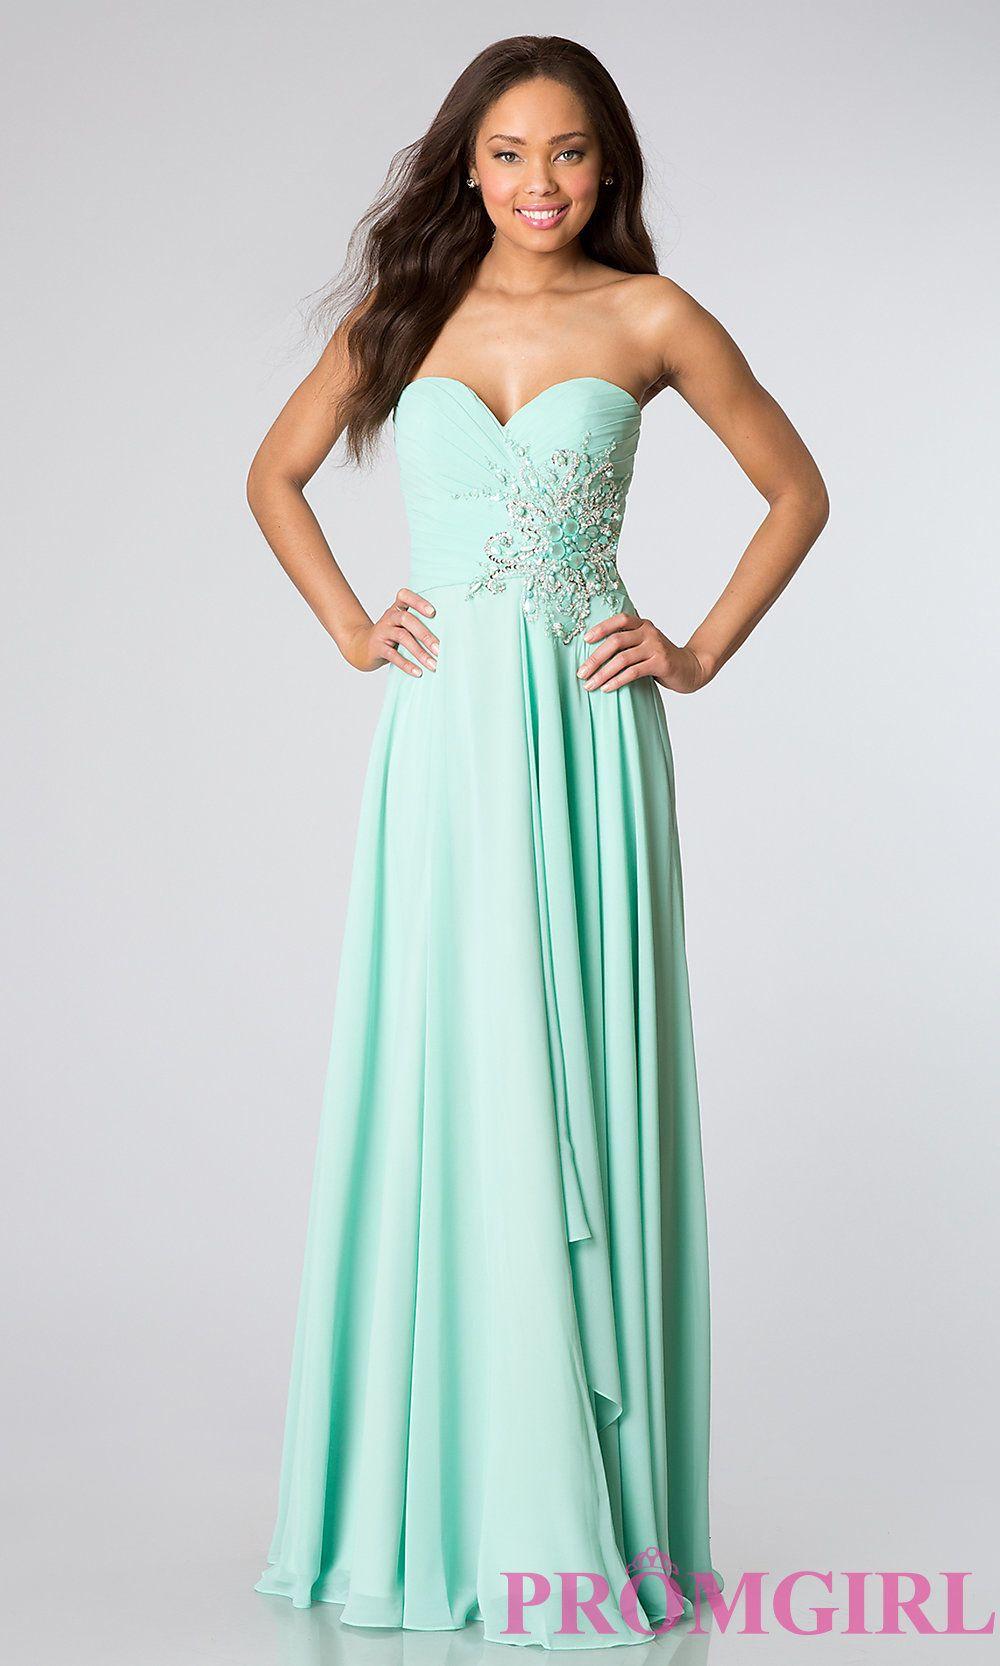 Fantastic Prom Dresses Dfw Gallery - All Wedding Dresses ...